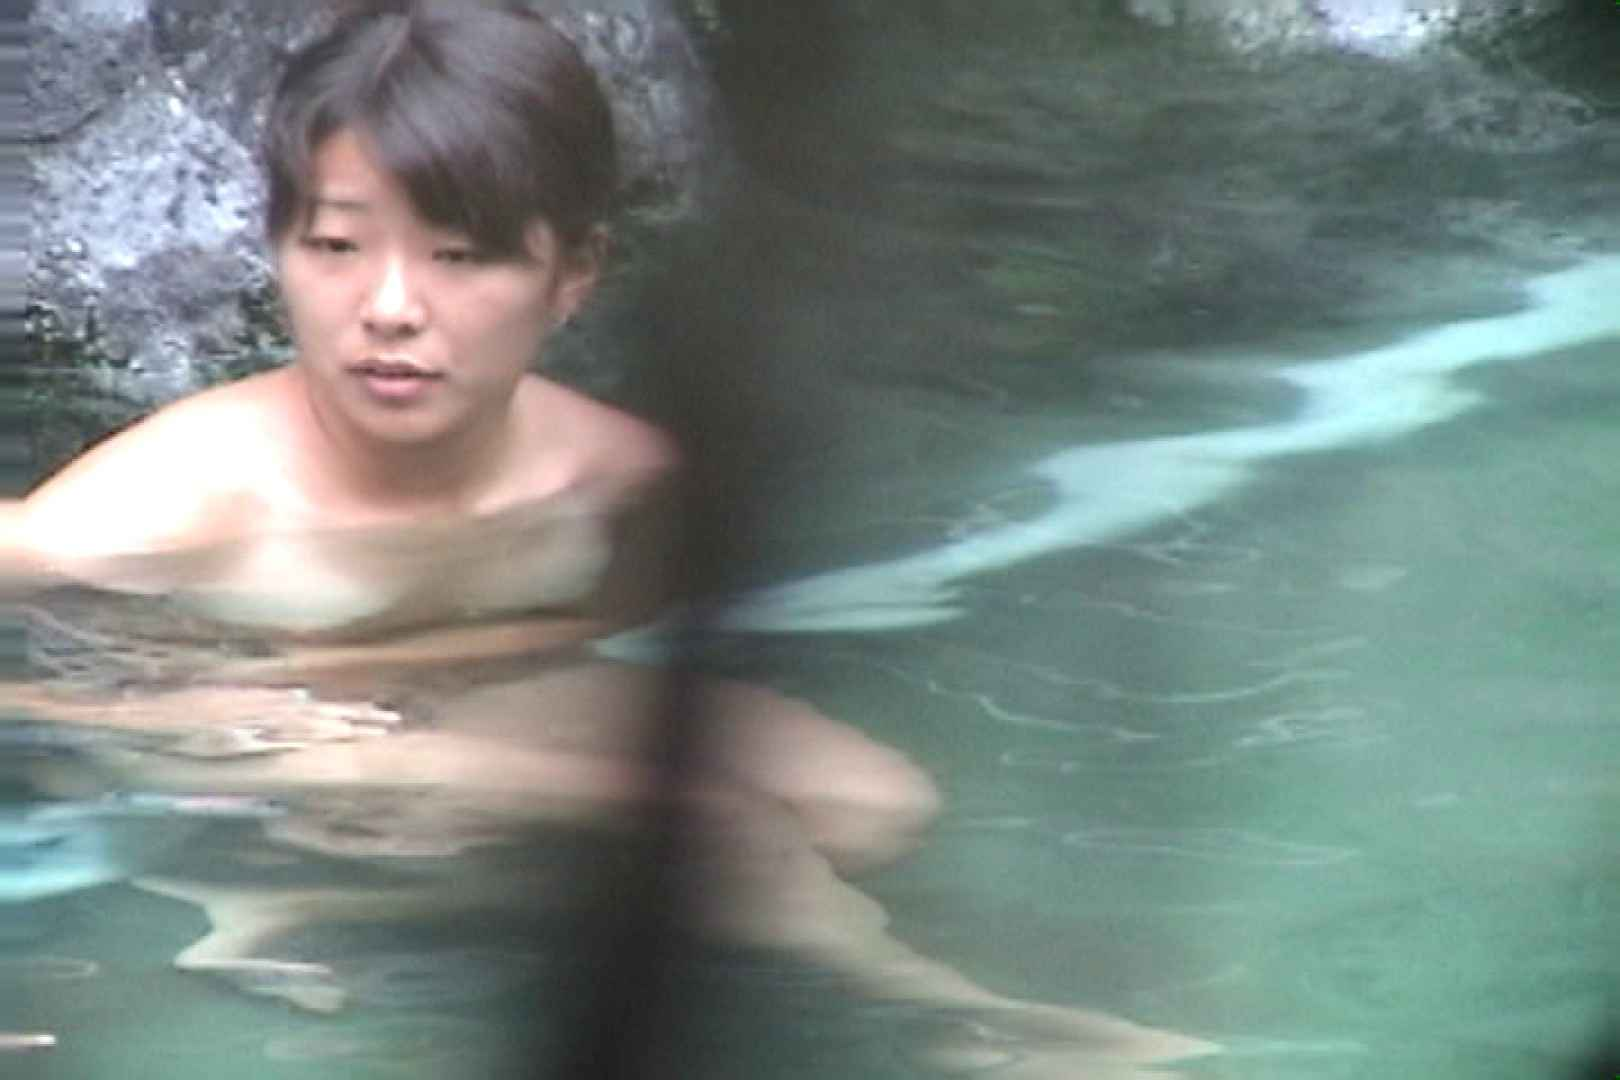 Aquaな露天風呂Vol.69【VIP限定】 OLのエロ生活   露天風呂  106連発 40